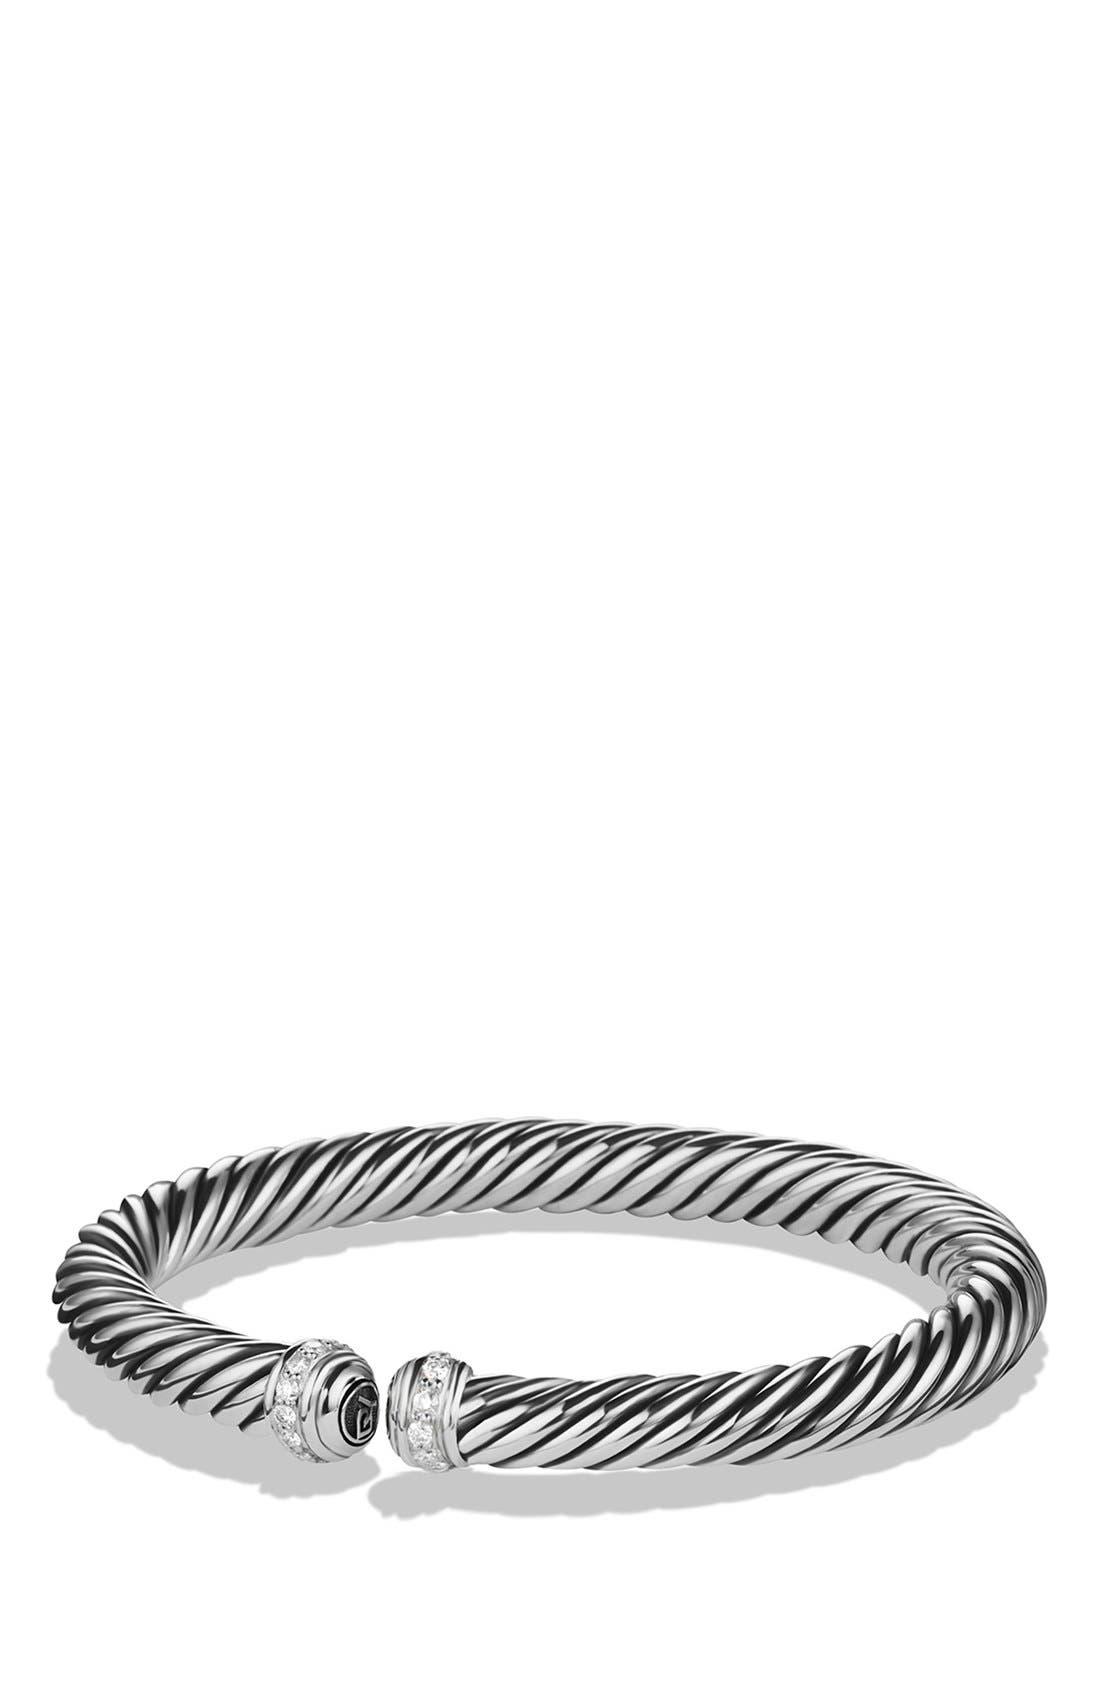 DAVID YURMAN Cable Classics Cable Spira Bracelet with Diamonds